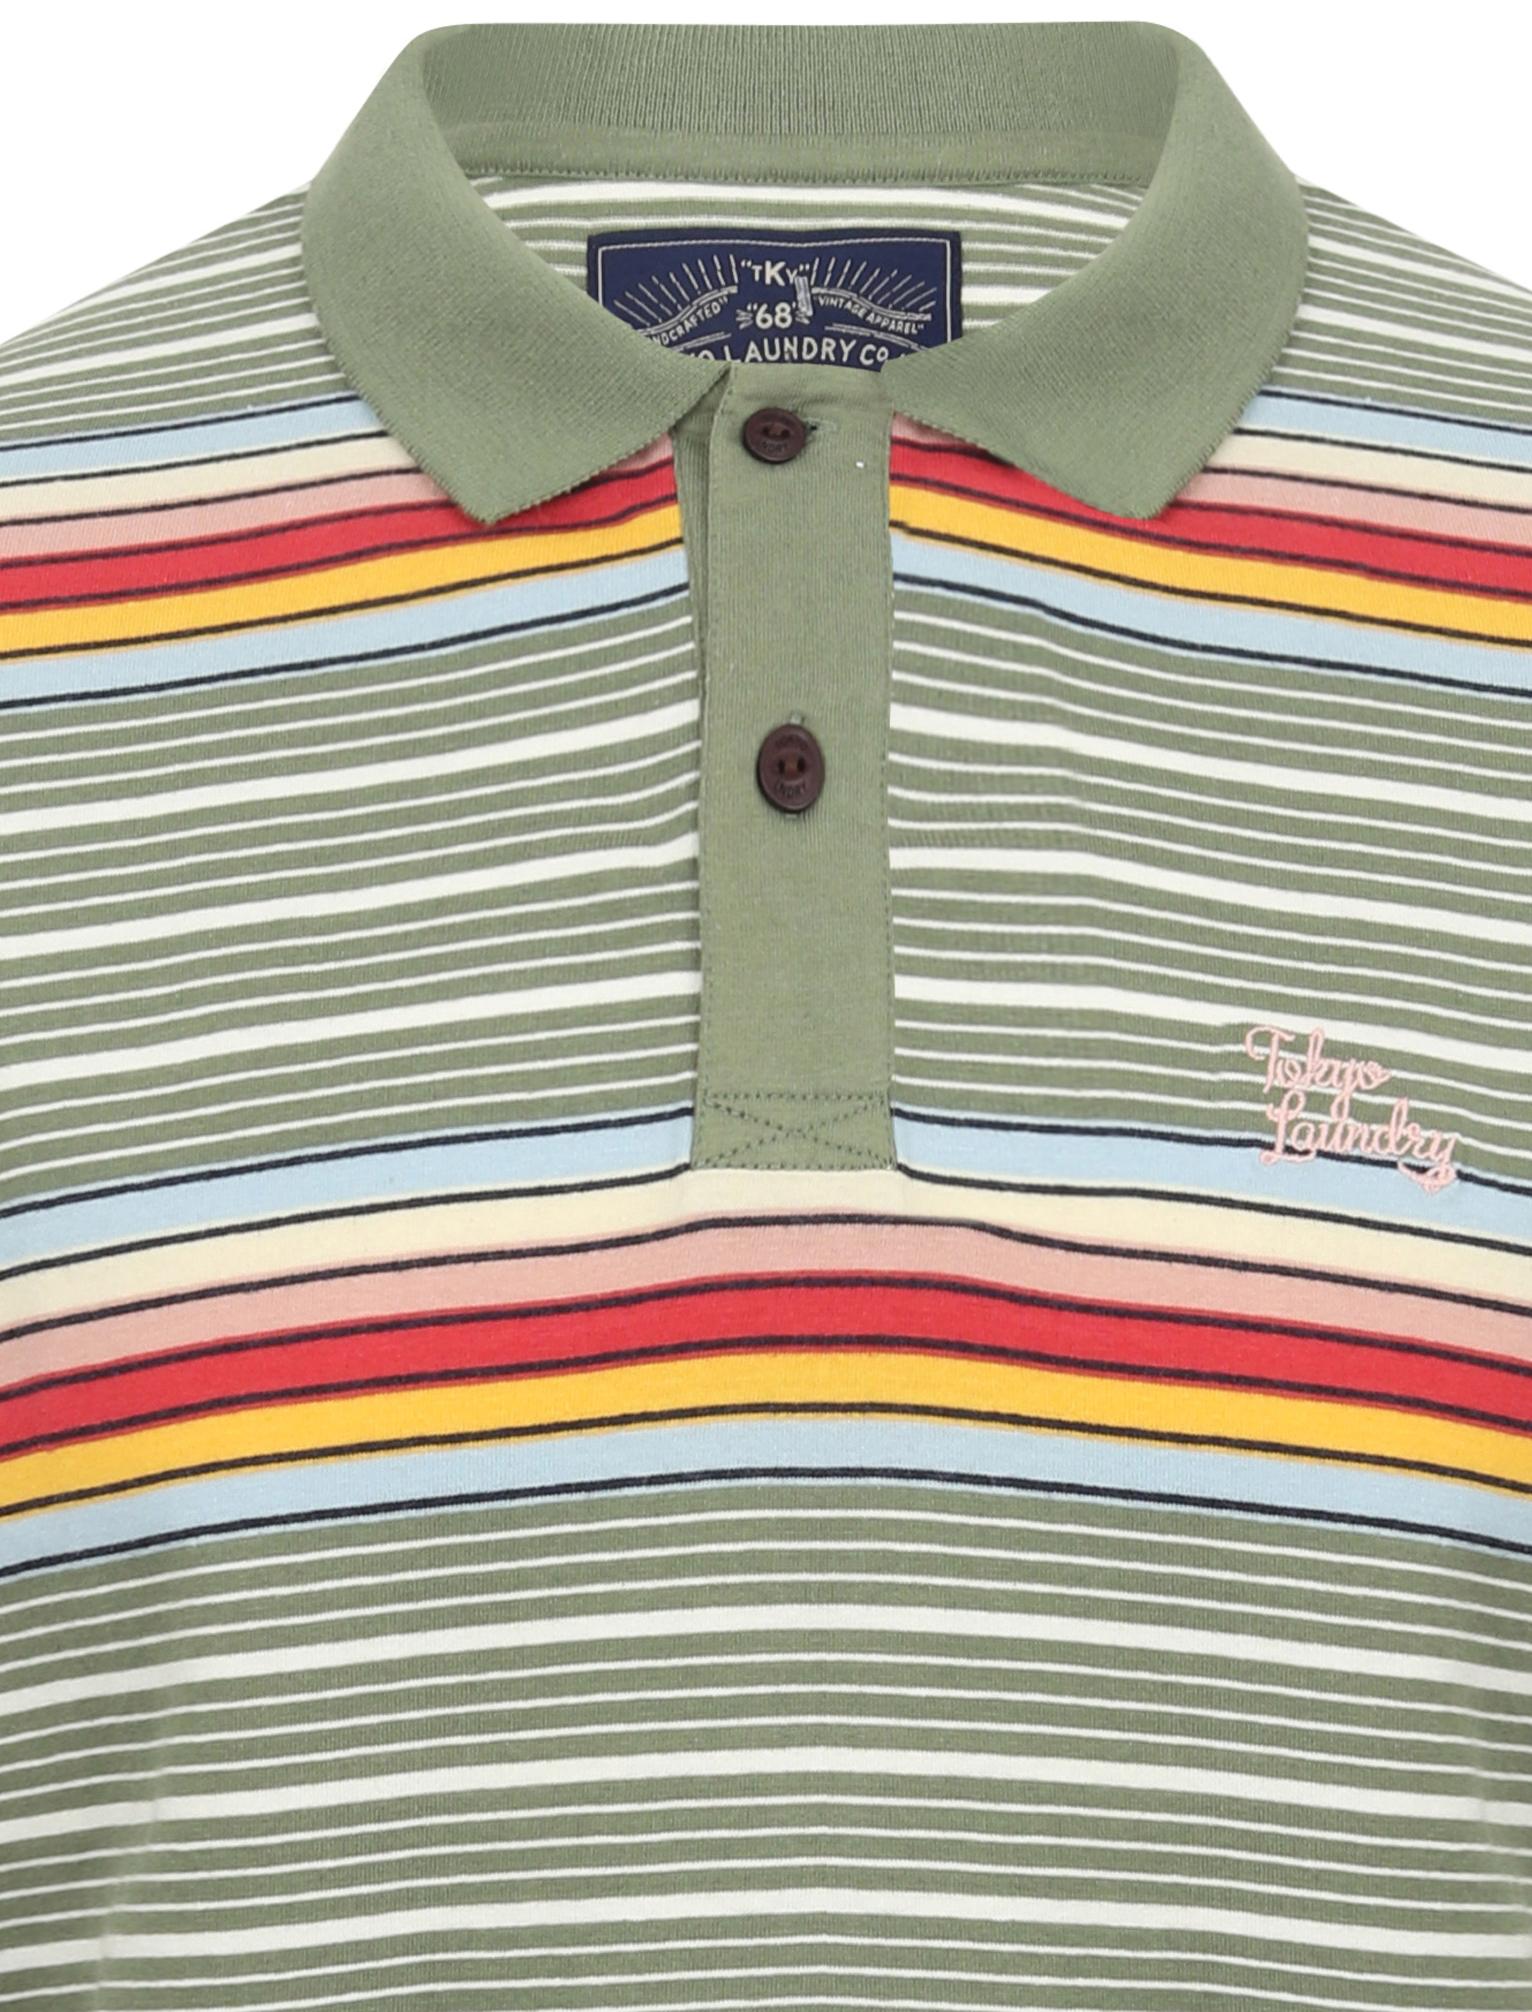 Tokyo-Laundry-Men-039-s-Bakersfield-Striped-Polo-Shirt-Stripy-Retro-Vintage-T-Shirt thumbnail 7